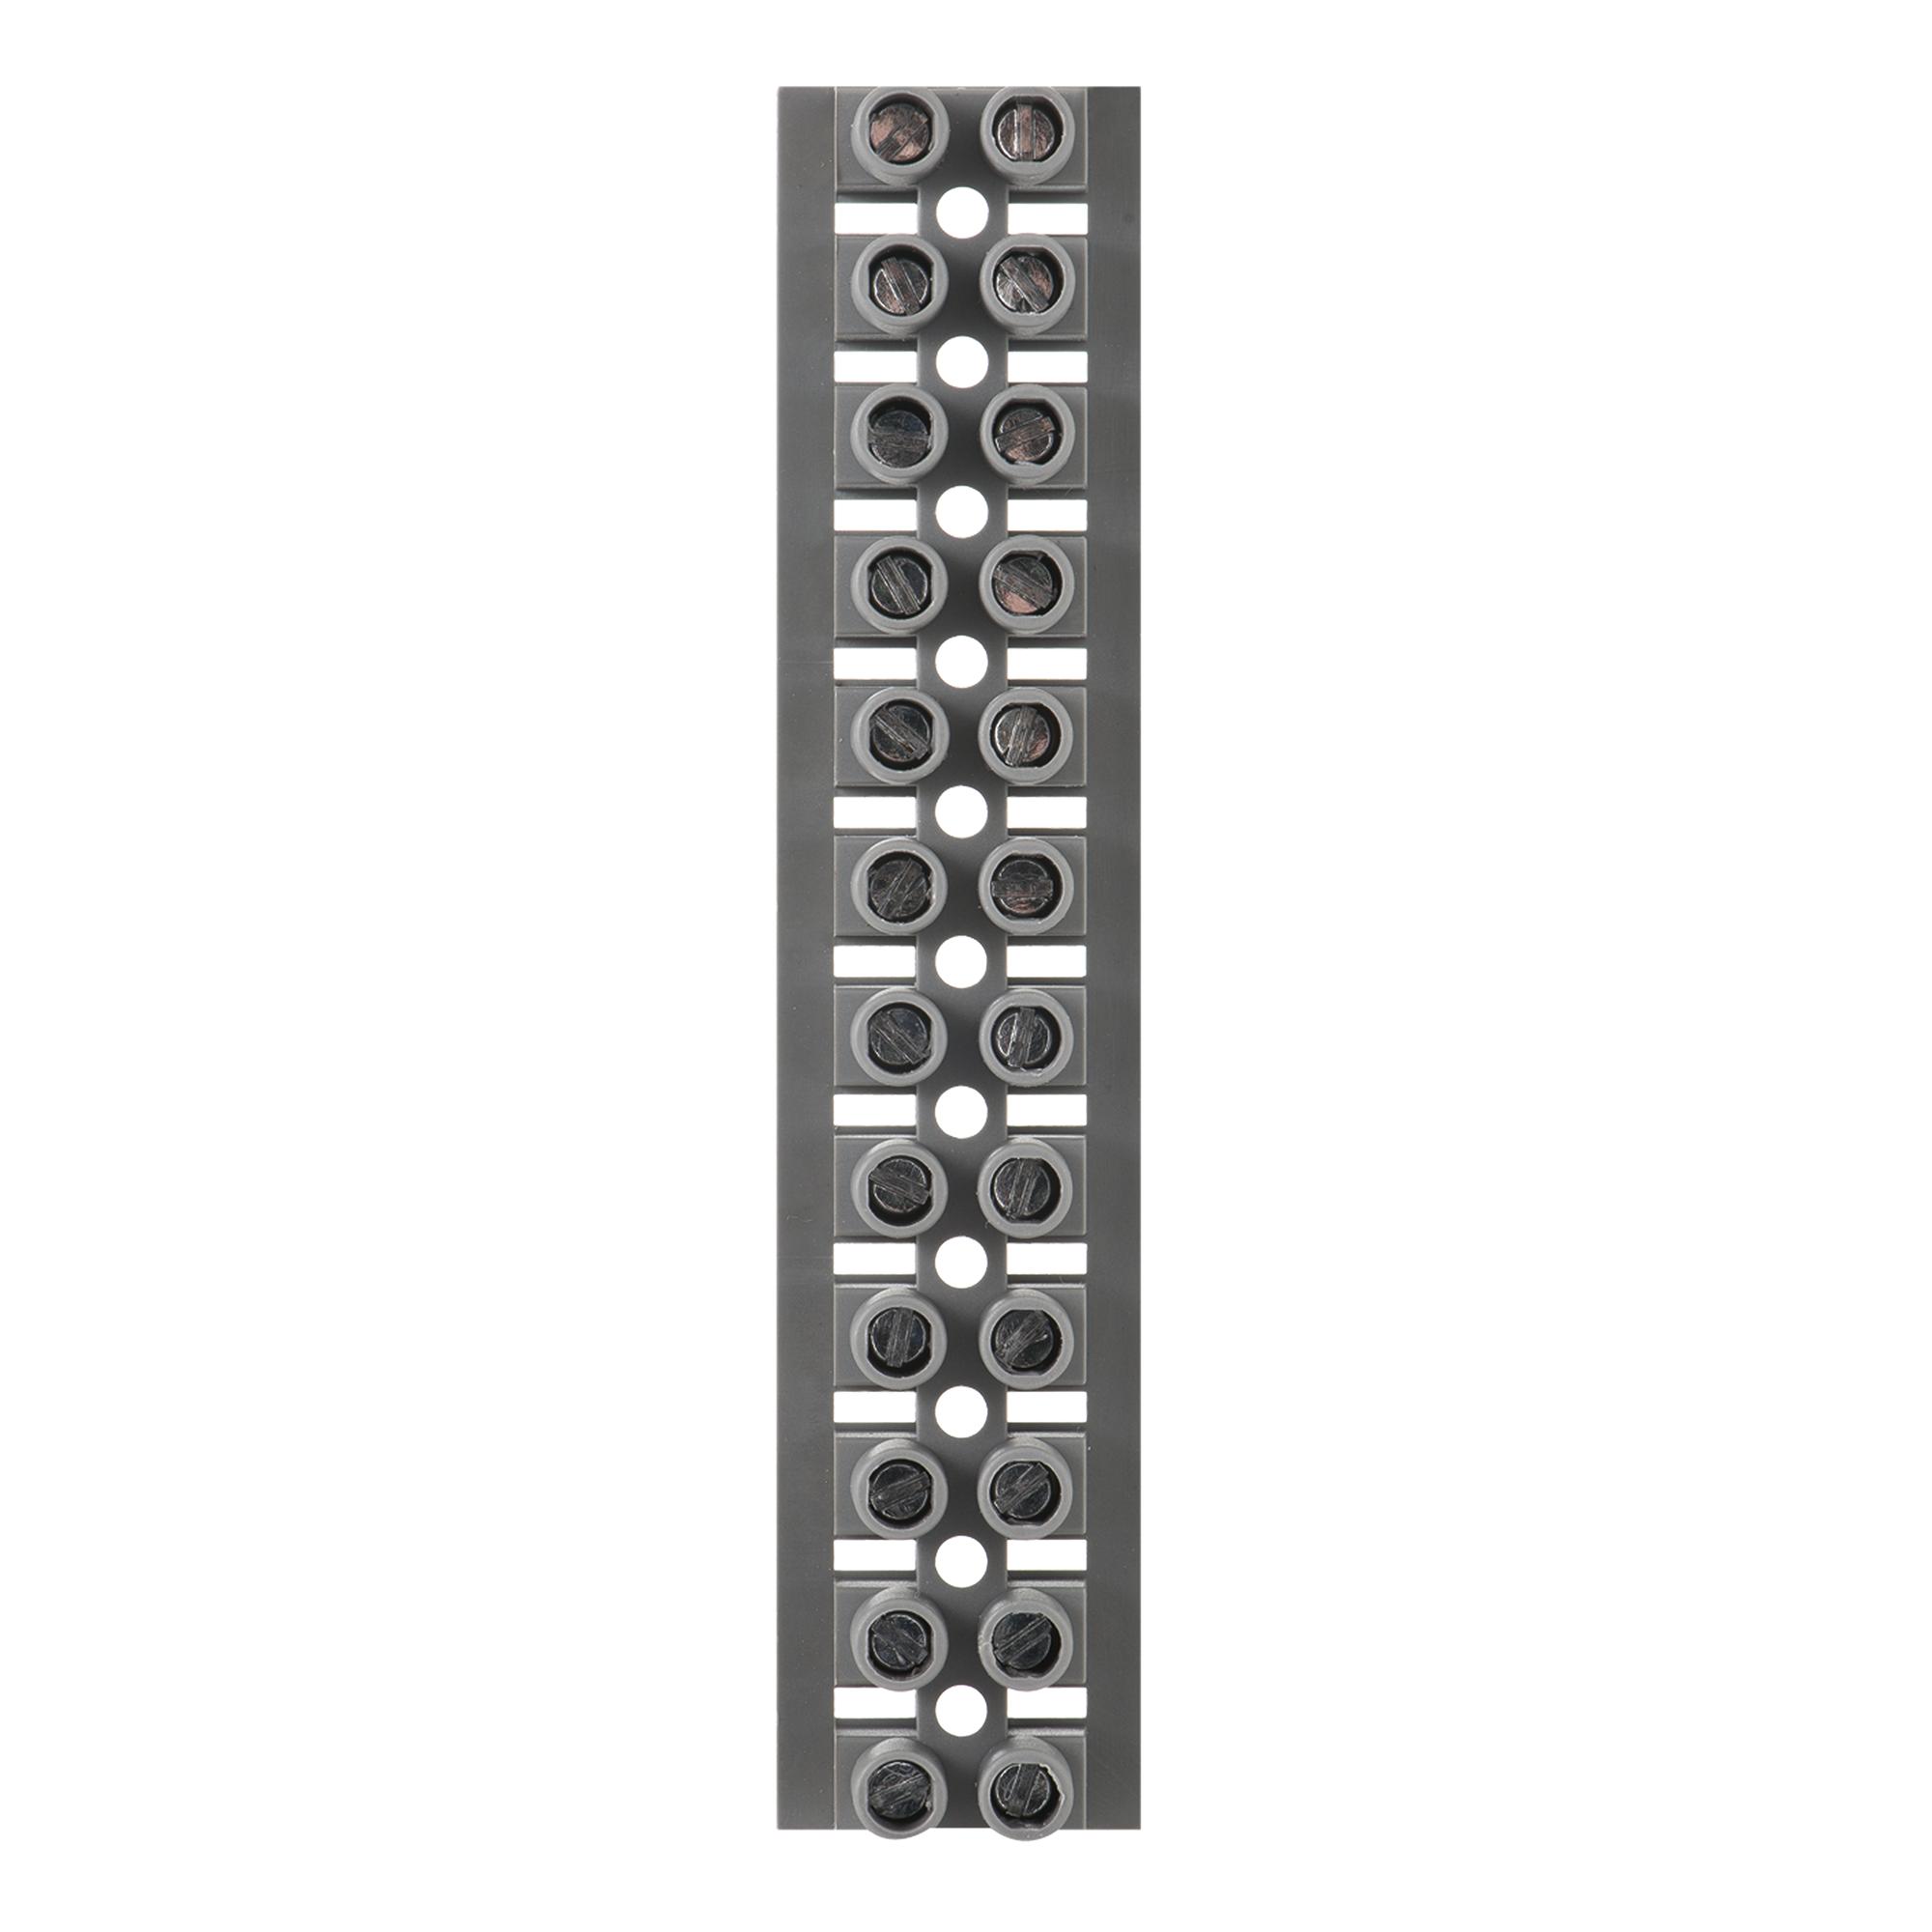 12 terminal connector strip